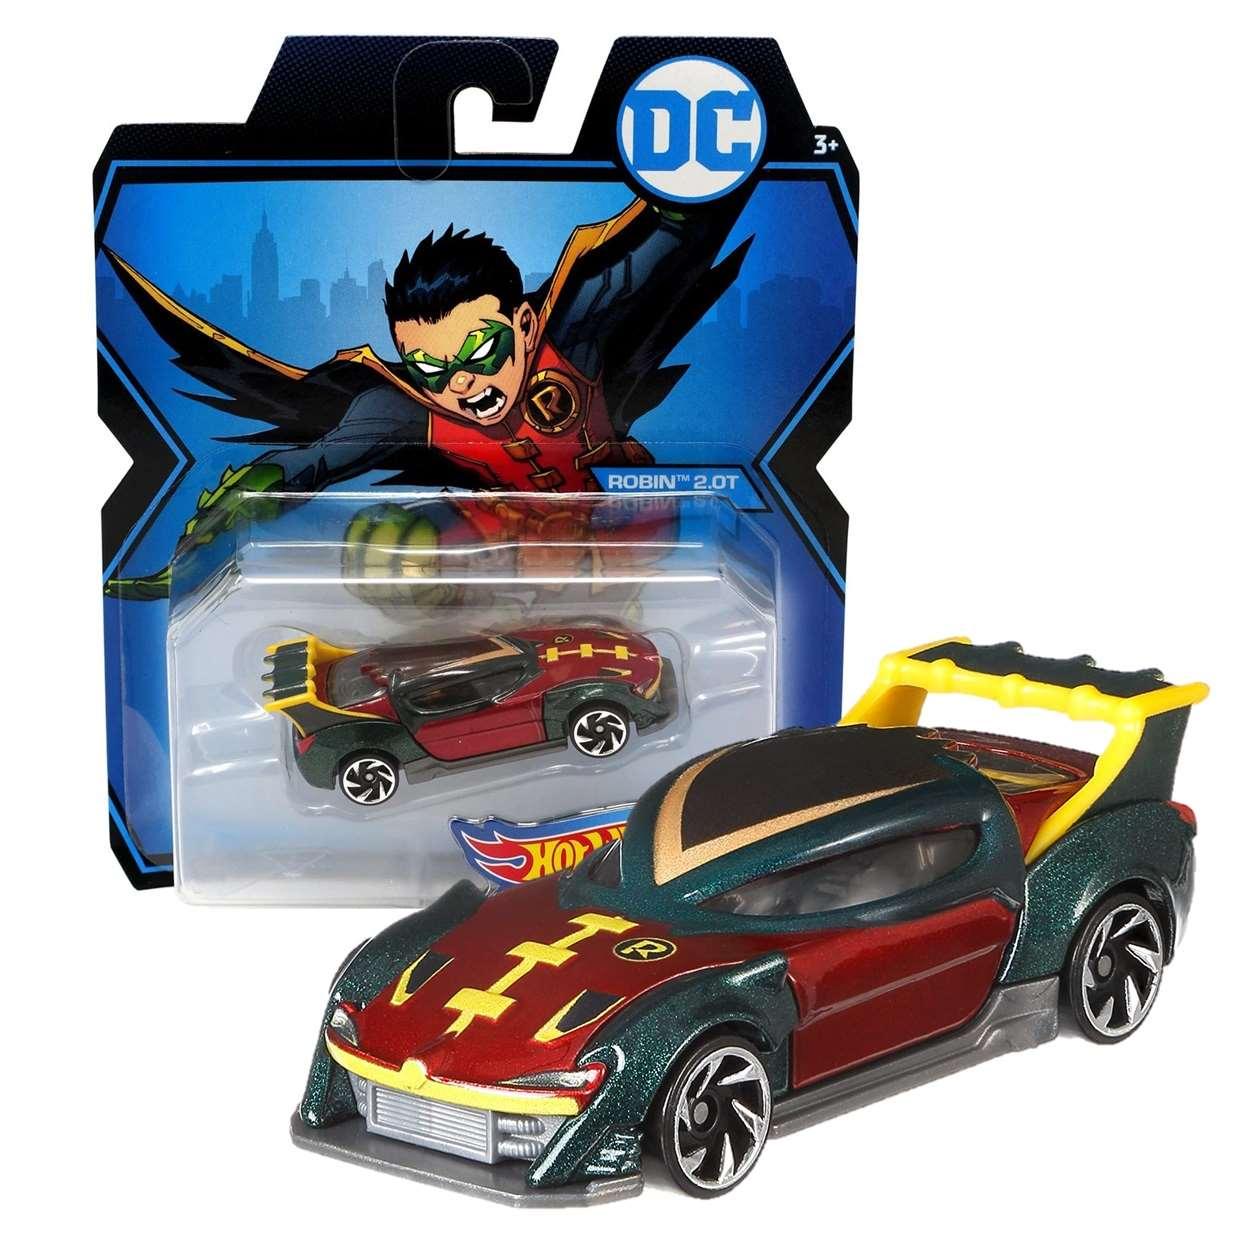 Robin 2.0 T Gmh95 Hot Wheels Character Cars Die Cast